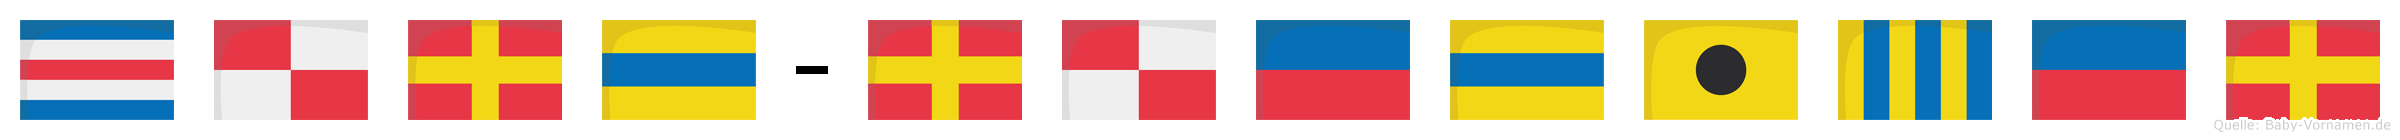 Curd-Rüdiger im Flaggenalphabet